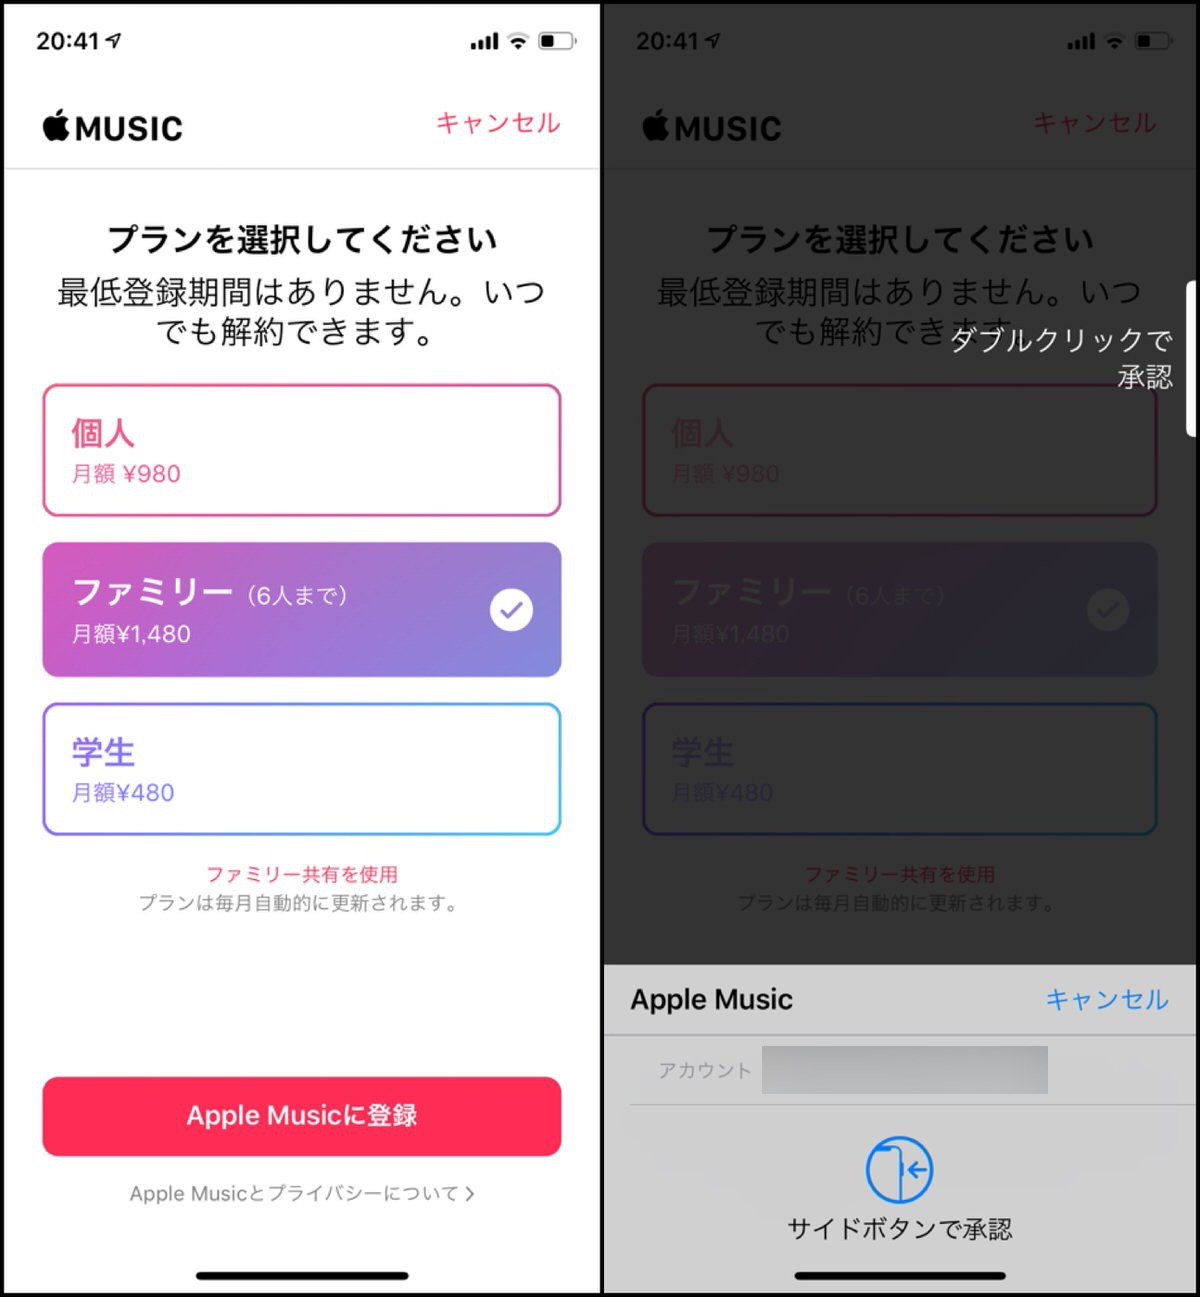 Apple Music−2